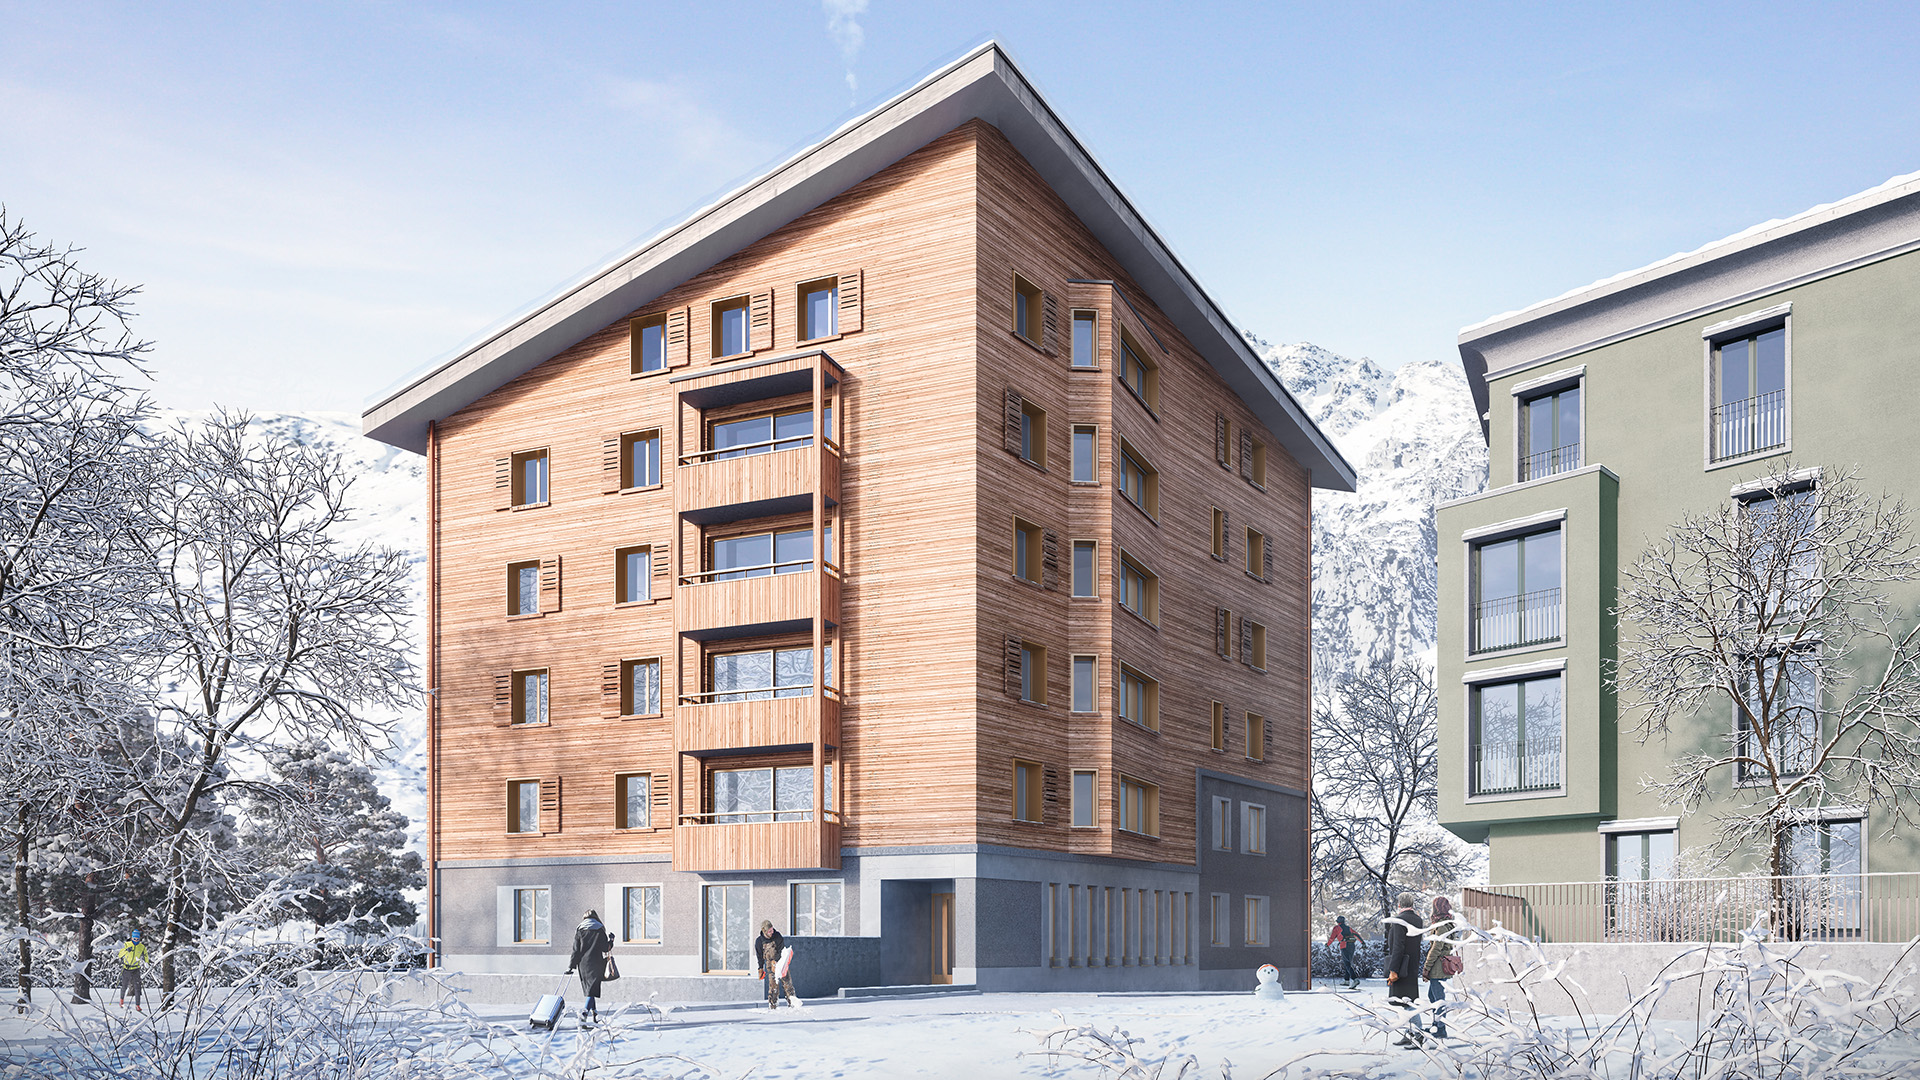 House Arve Apartments, Switzerland